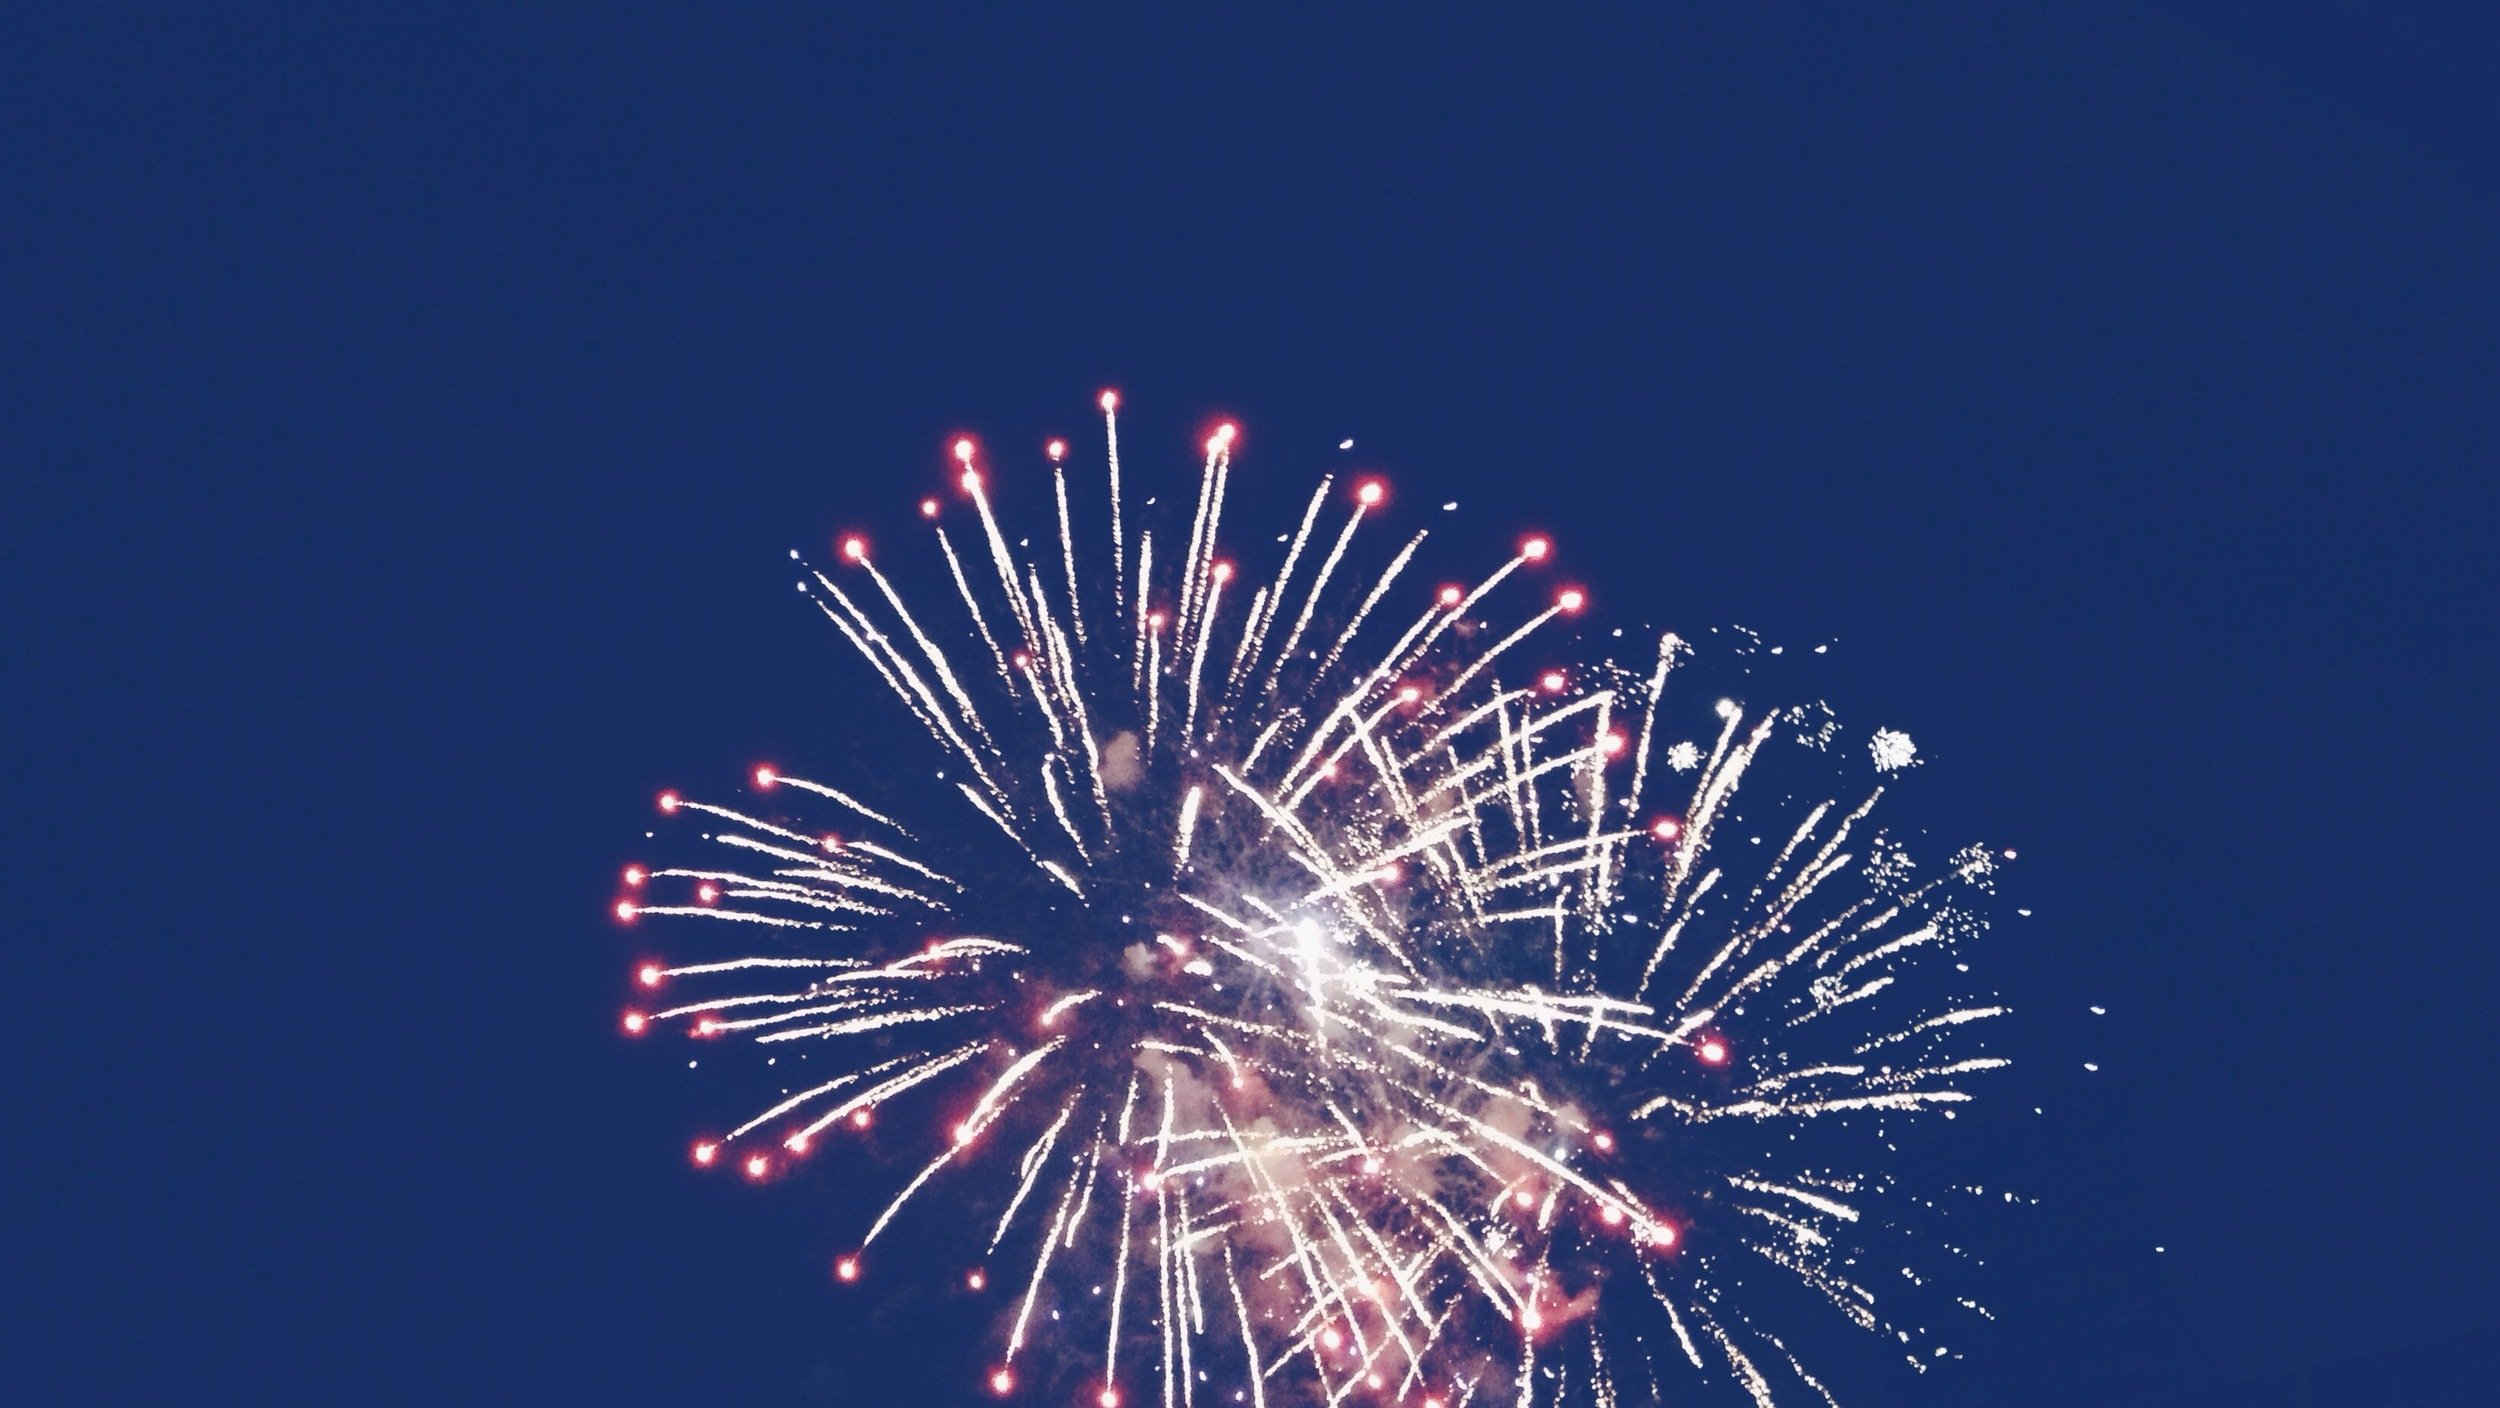 Obligatory fireworks photo.